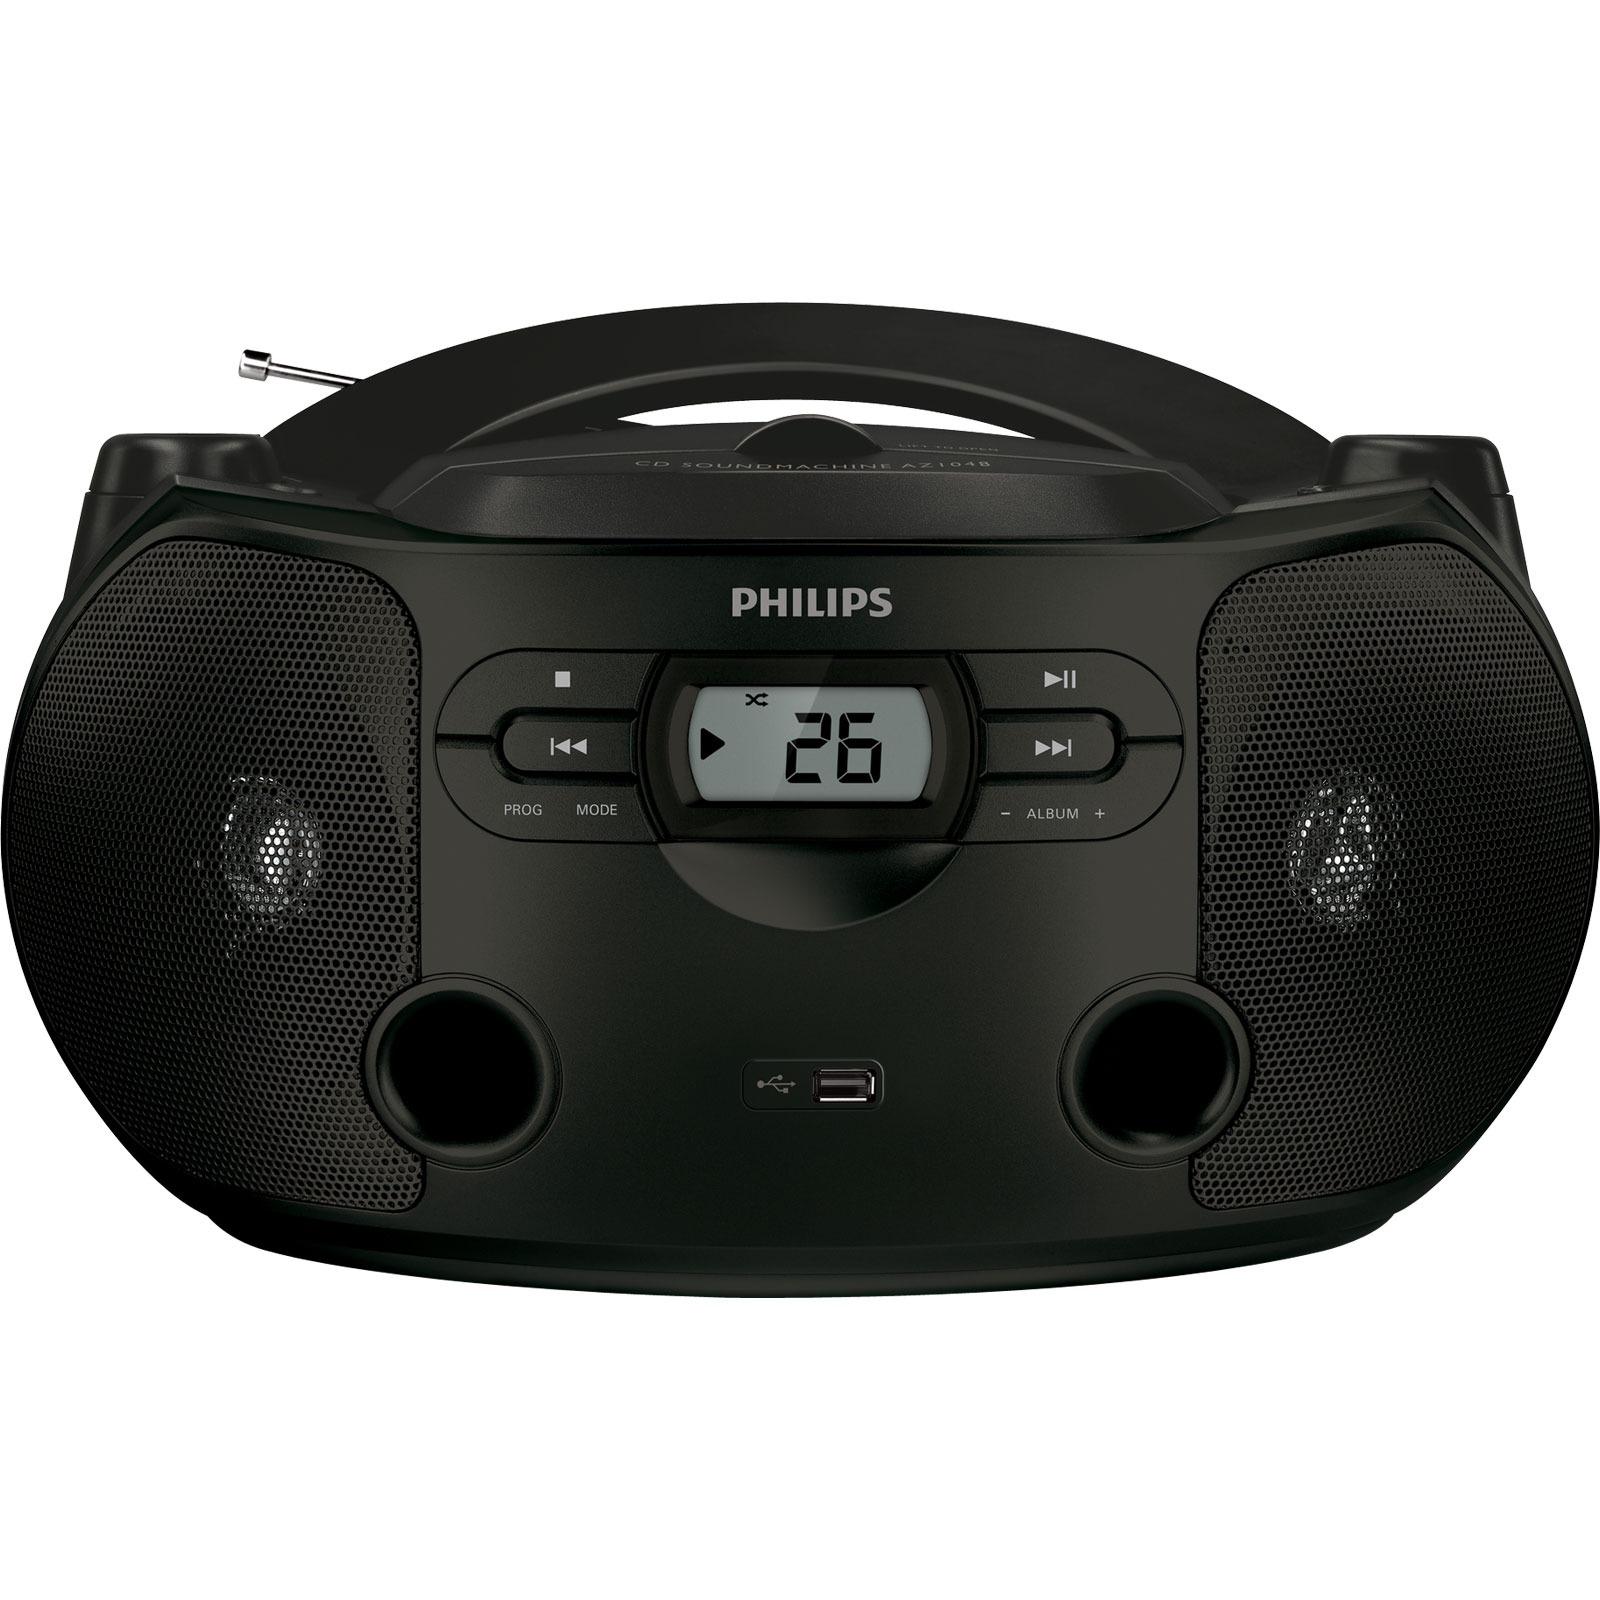 philips az1048 radio radio r veil philips sur ldlc. Black Bedroom Furniture Sets. Home Design Ideas